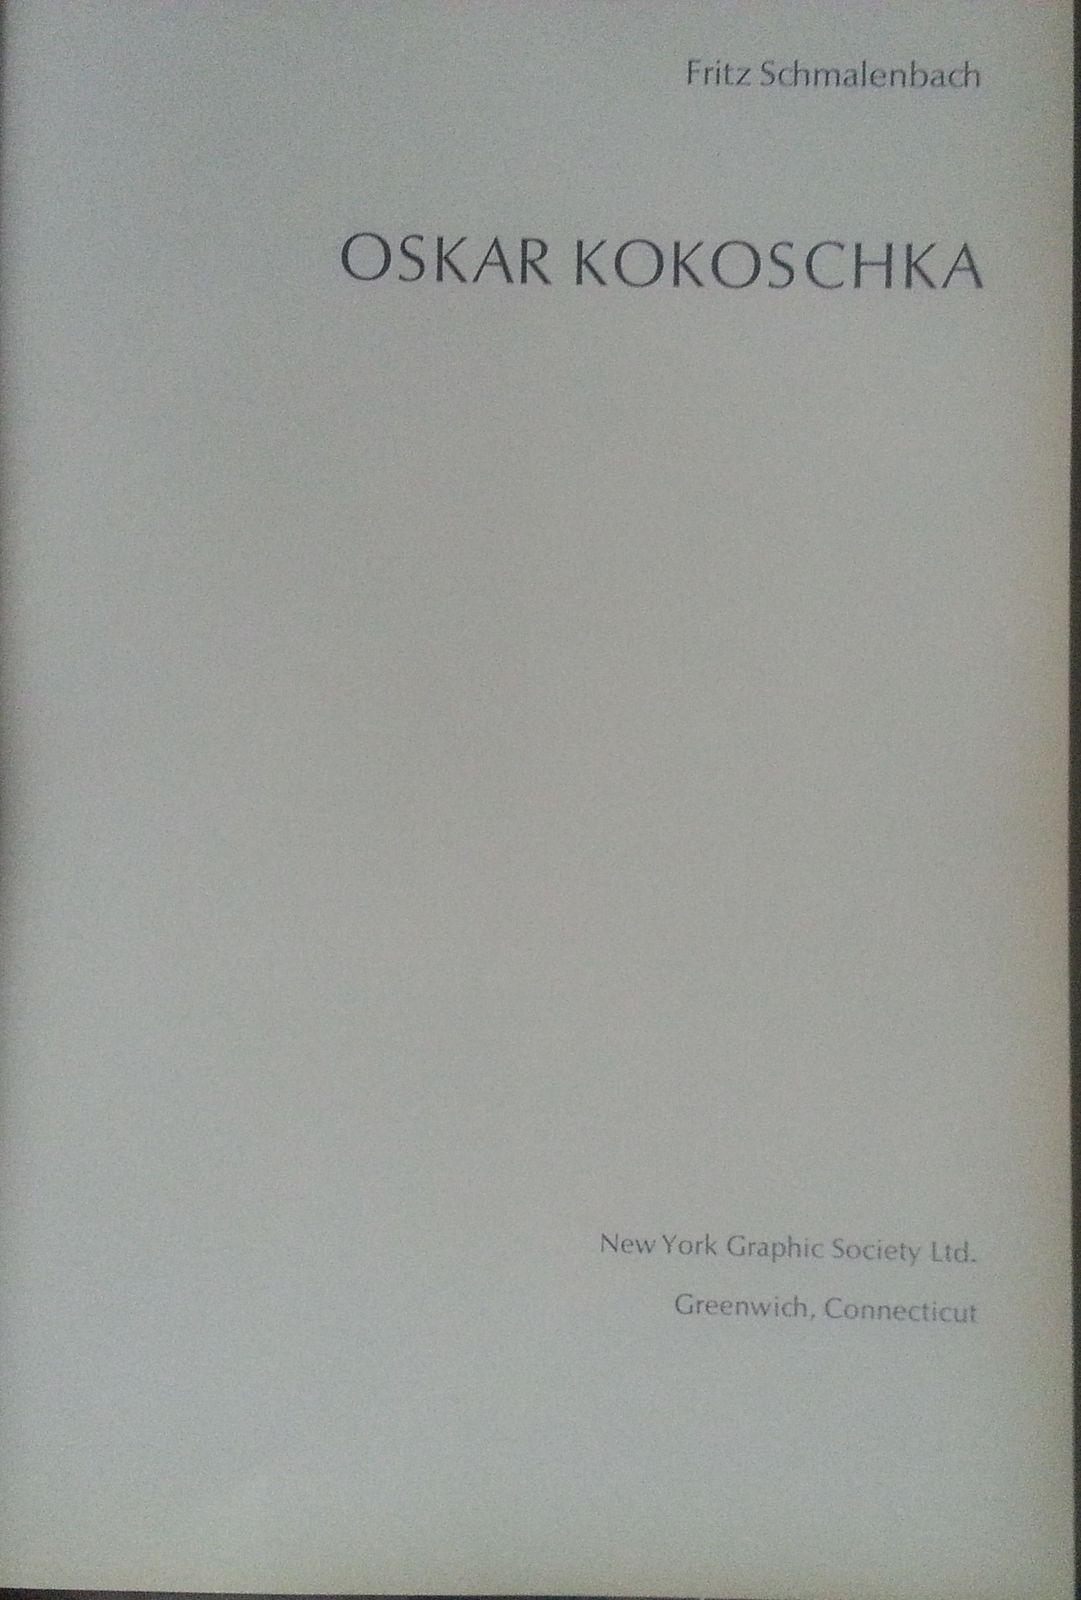 Kokoschka by Fritz Schmalenbach 1967 HBDJ 48 Color Plates